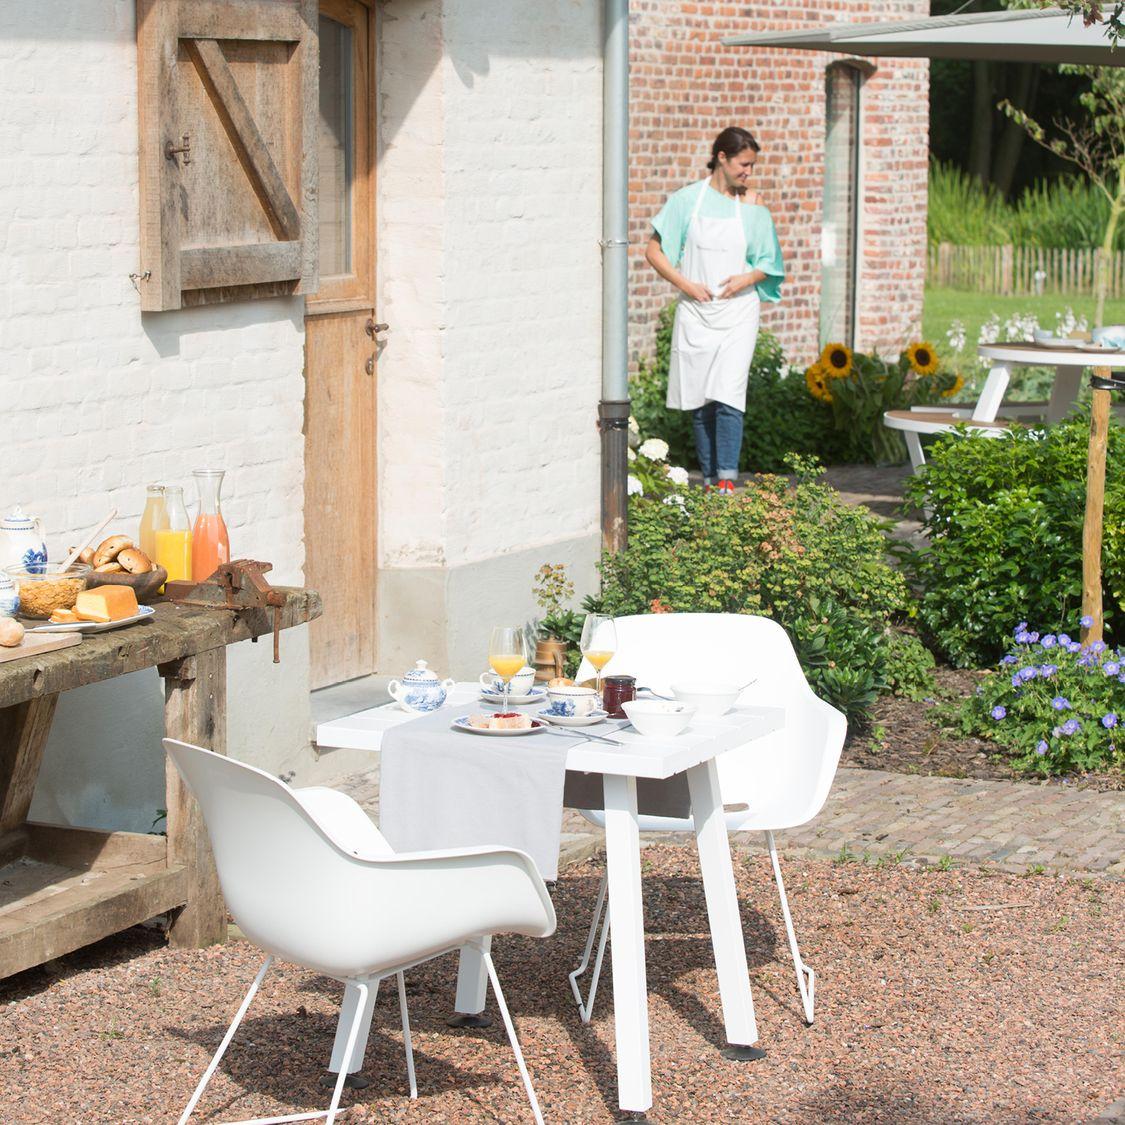 Breakfast at Blauwpoort